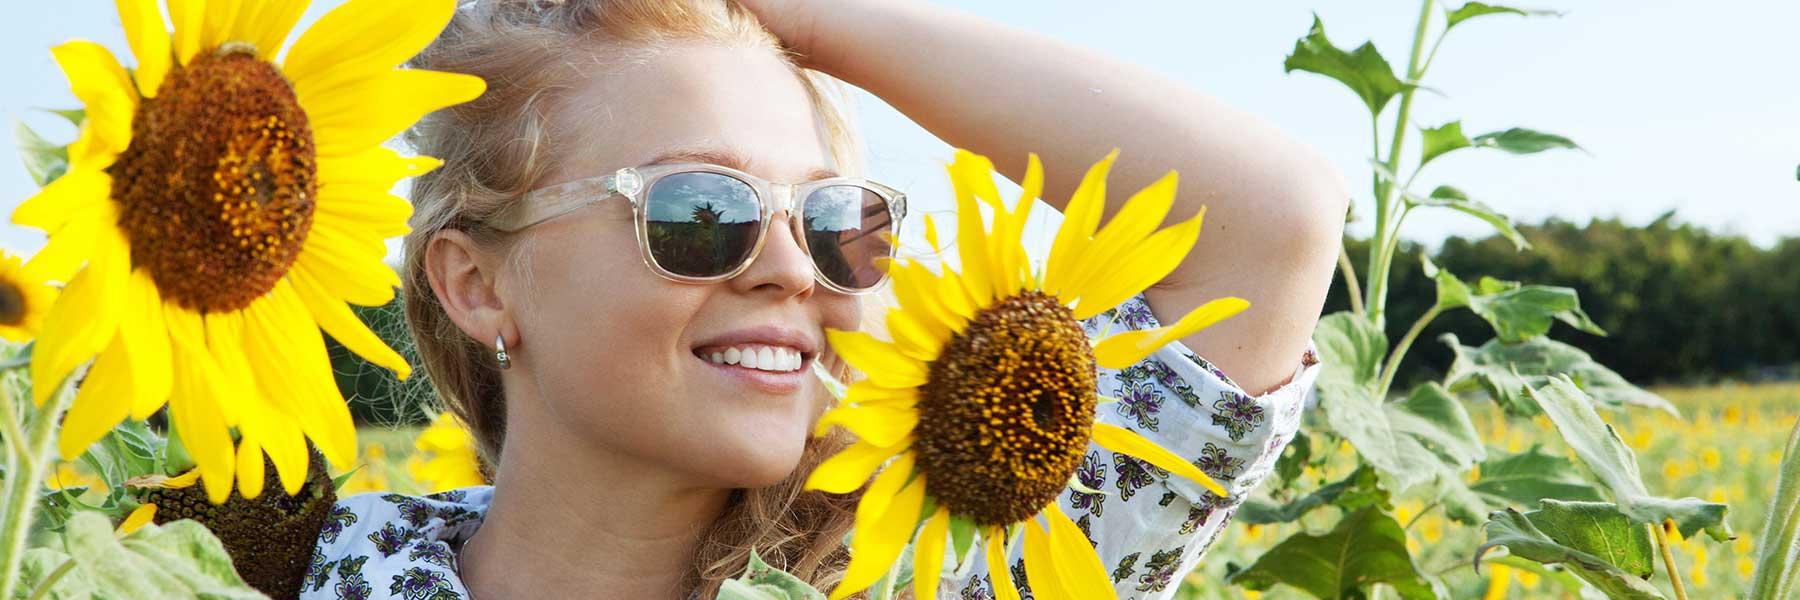 Christina Zehetner - Humorvolle Beratung mit der Sonnenblumentaktik